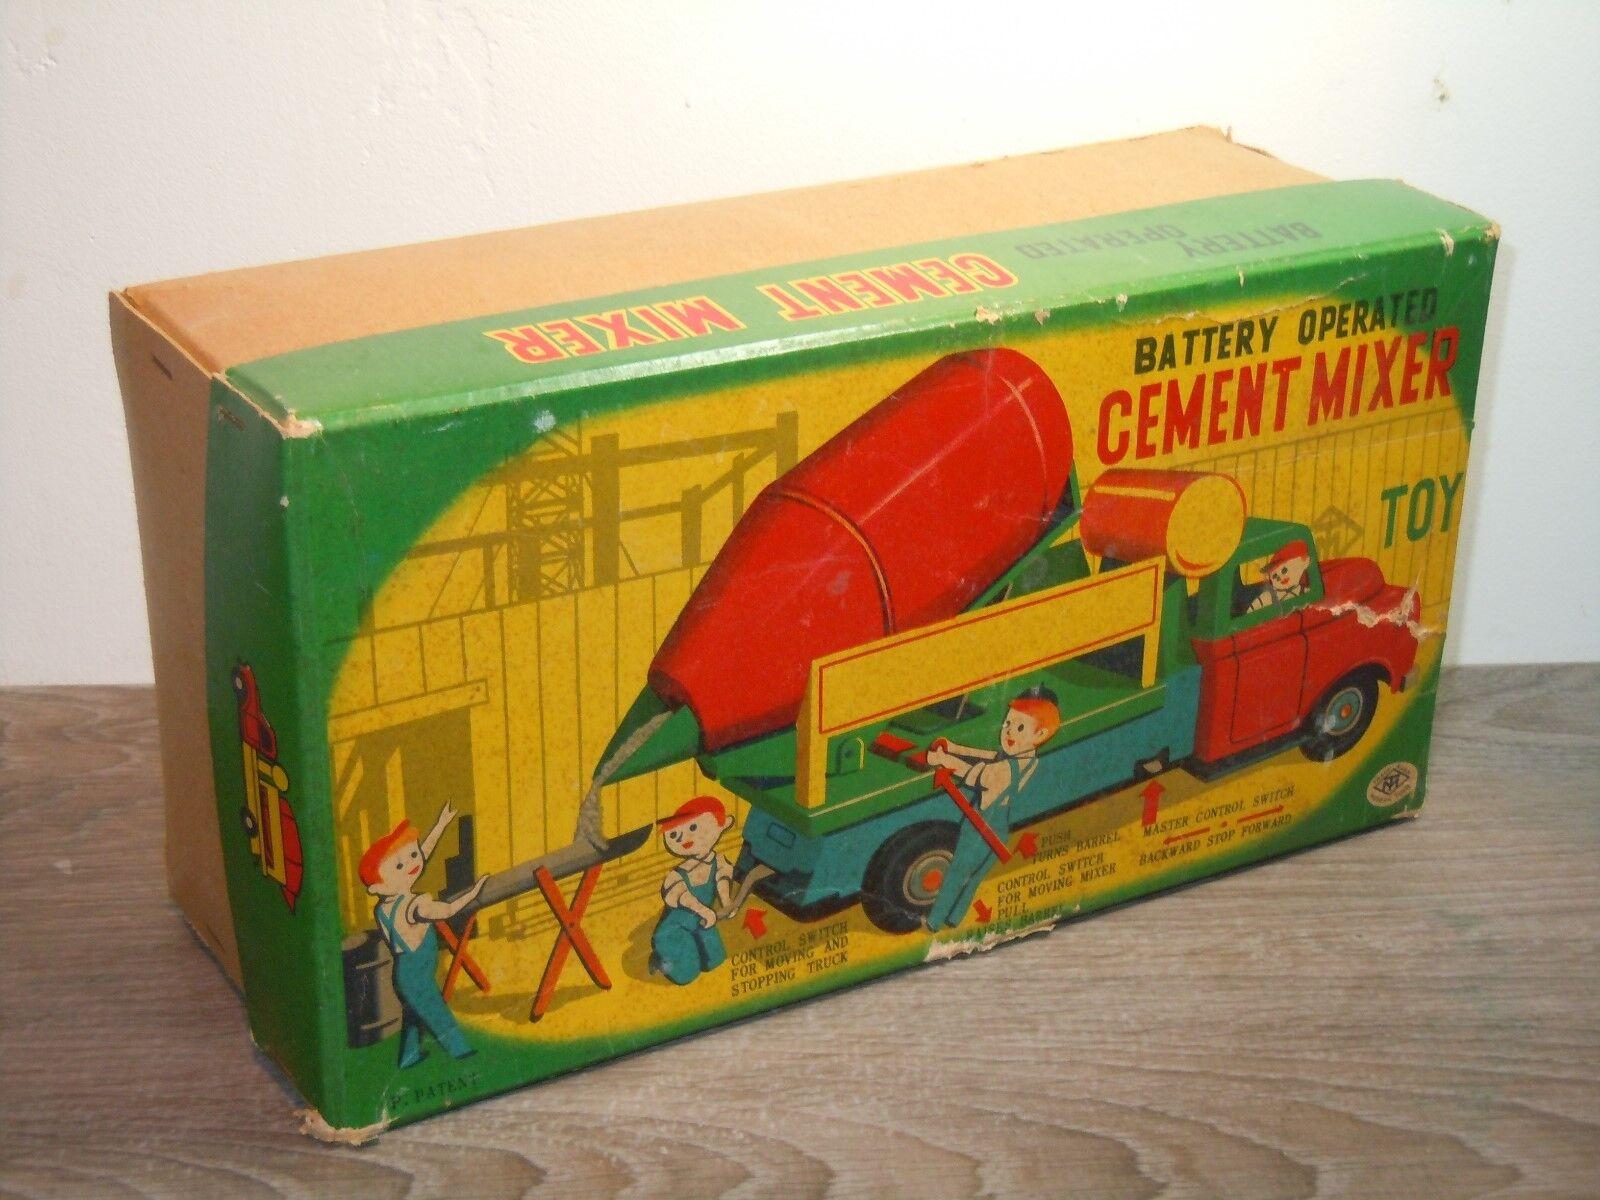 Battery Operated Cement Mixer Mixer Mixer - Modern Toys Masudaya Japan in Box 36182 f16d59